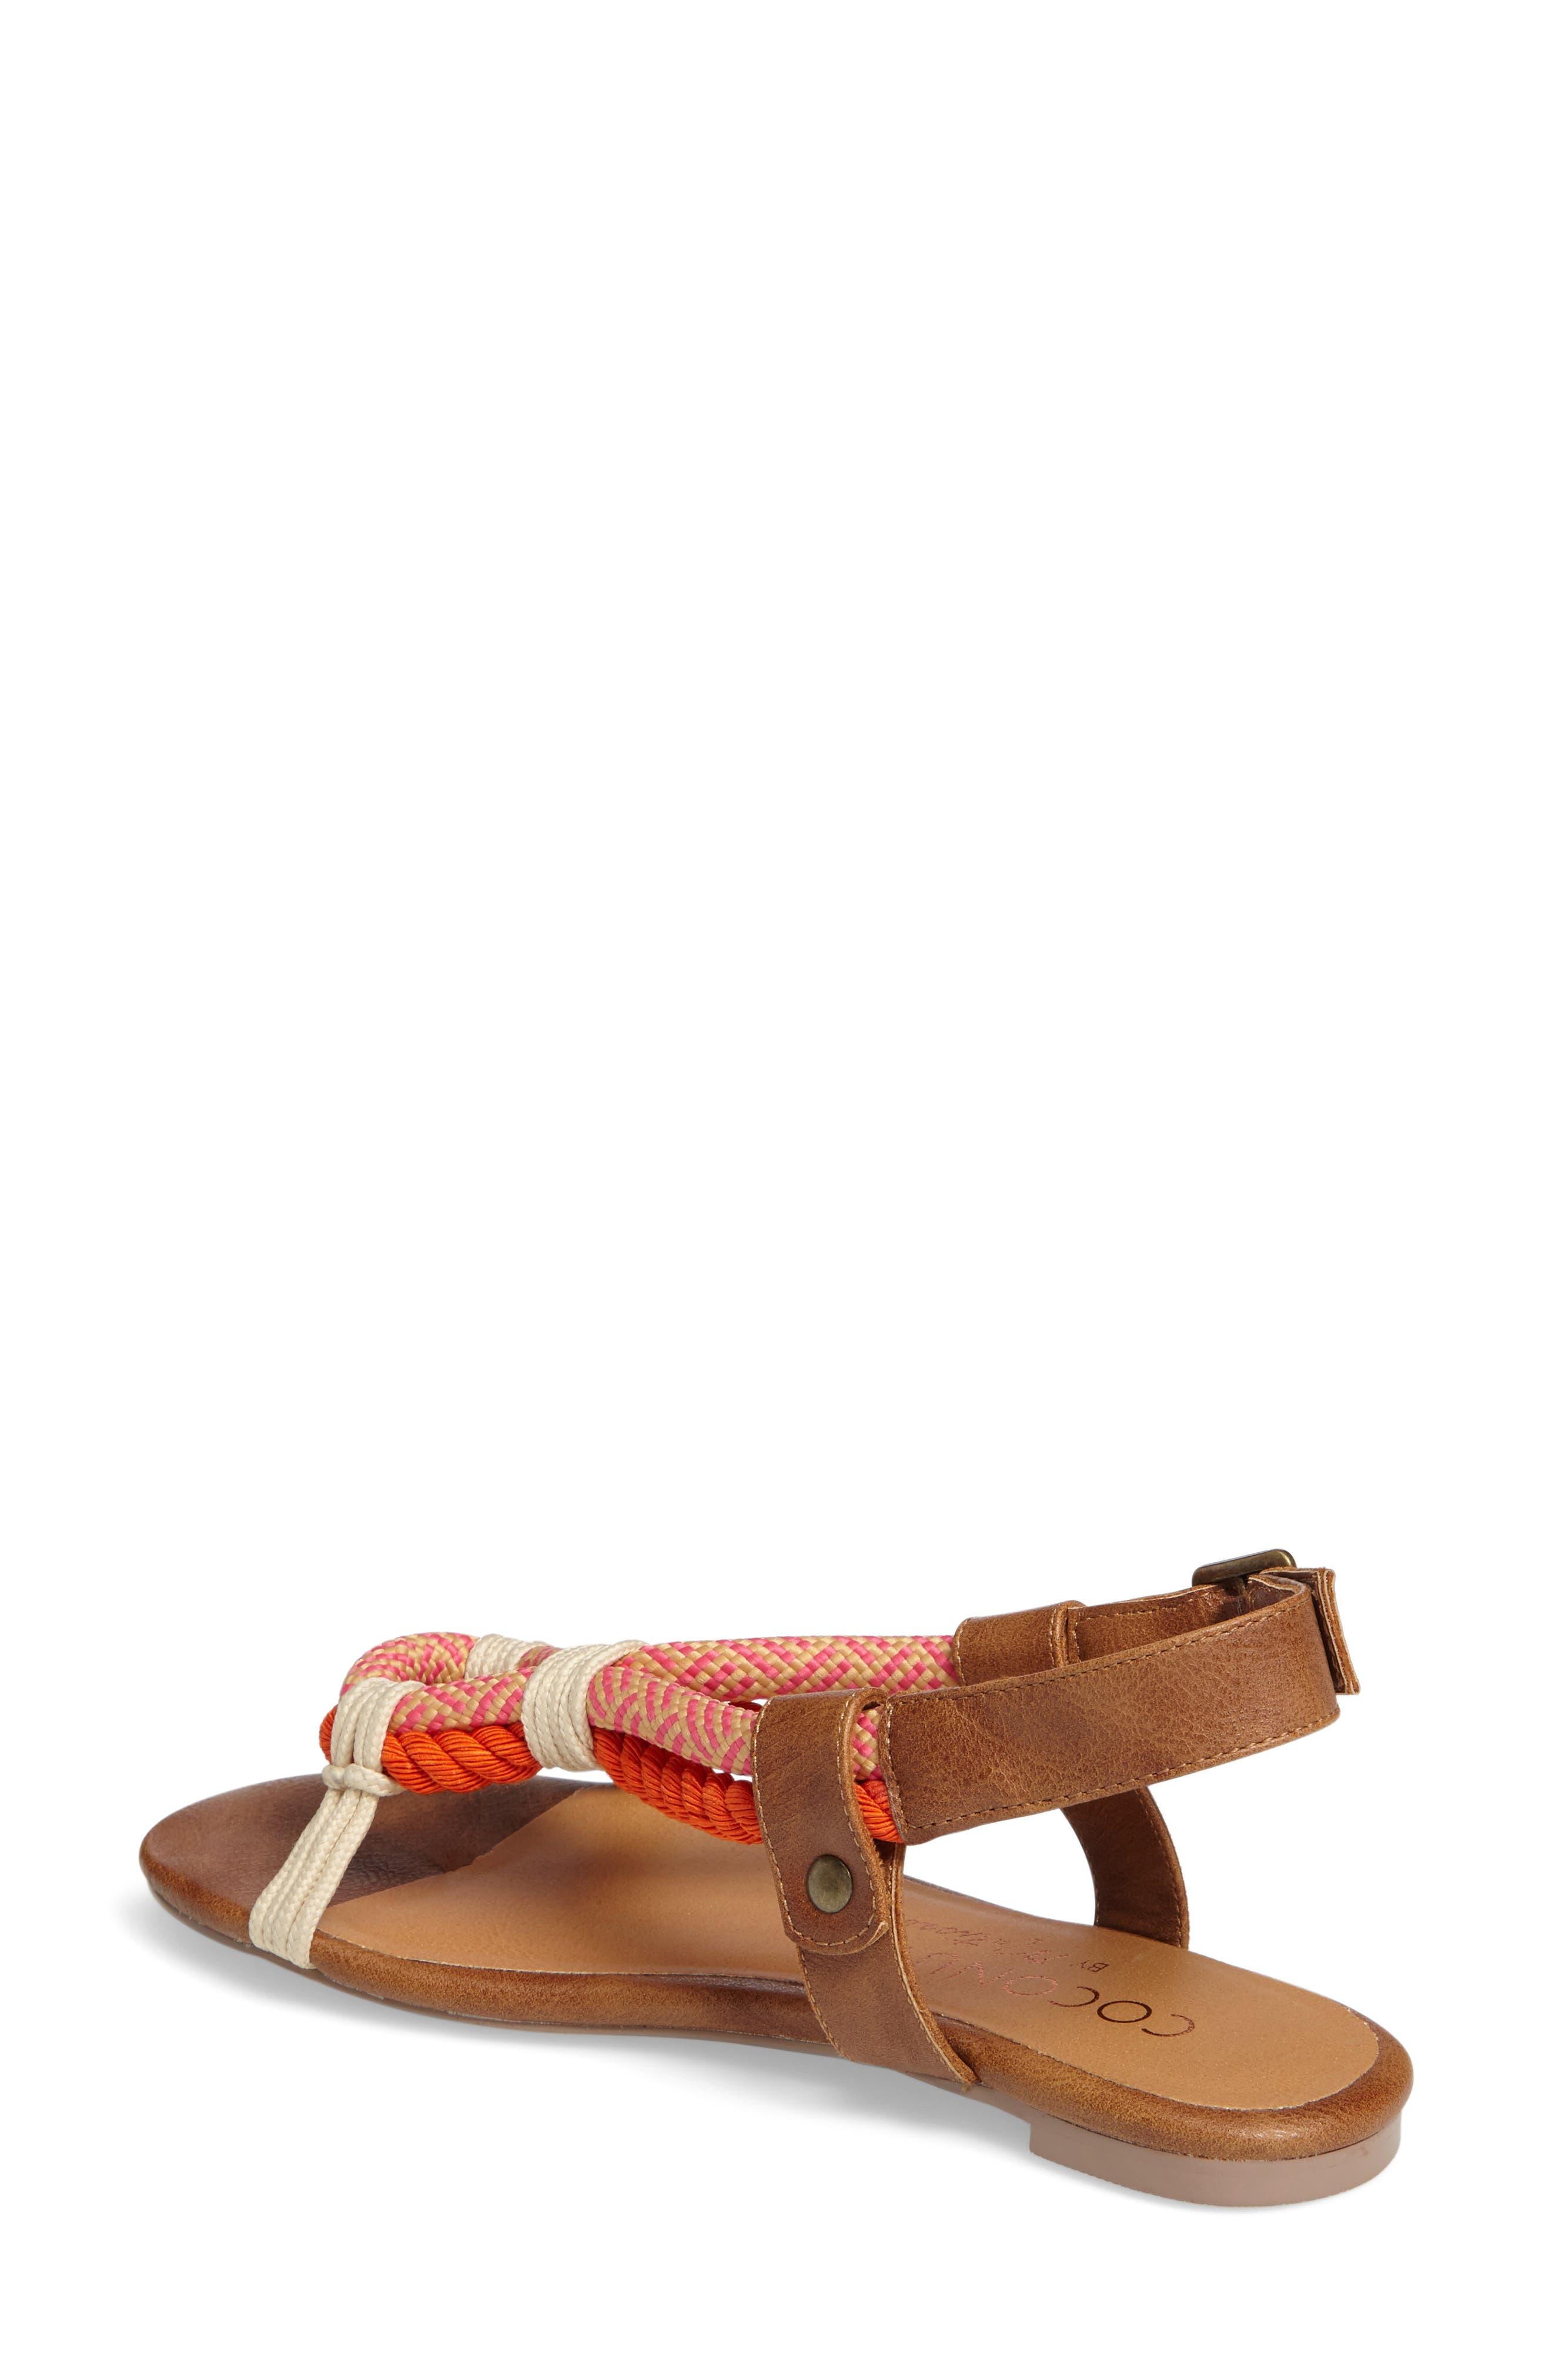 Matisse Parlay Sandal,                             Alternate thumbnail 2, color,                             Tan Fabric